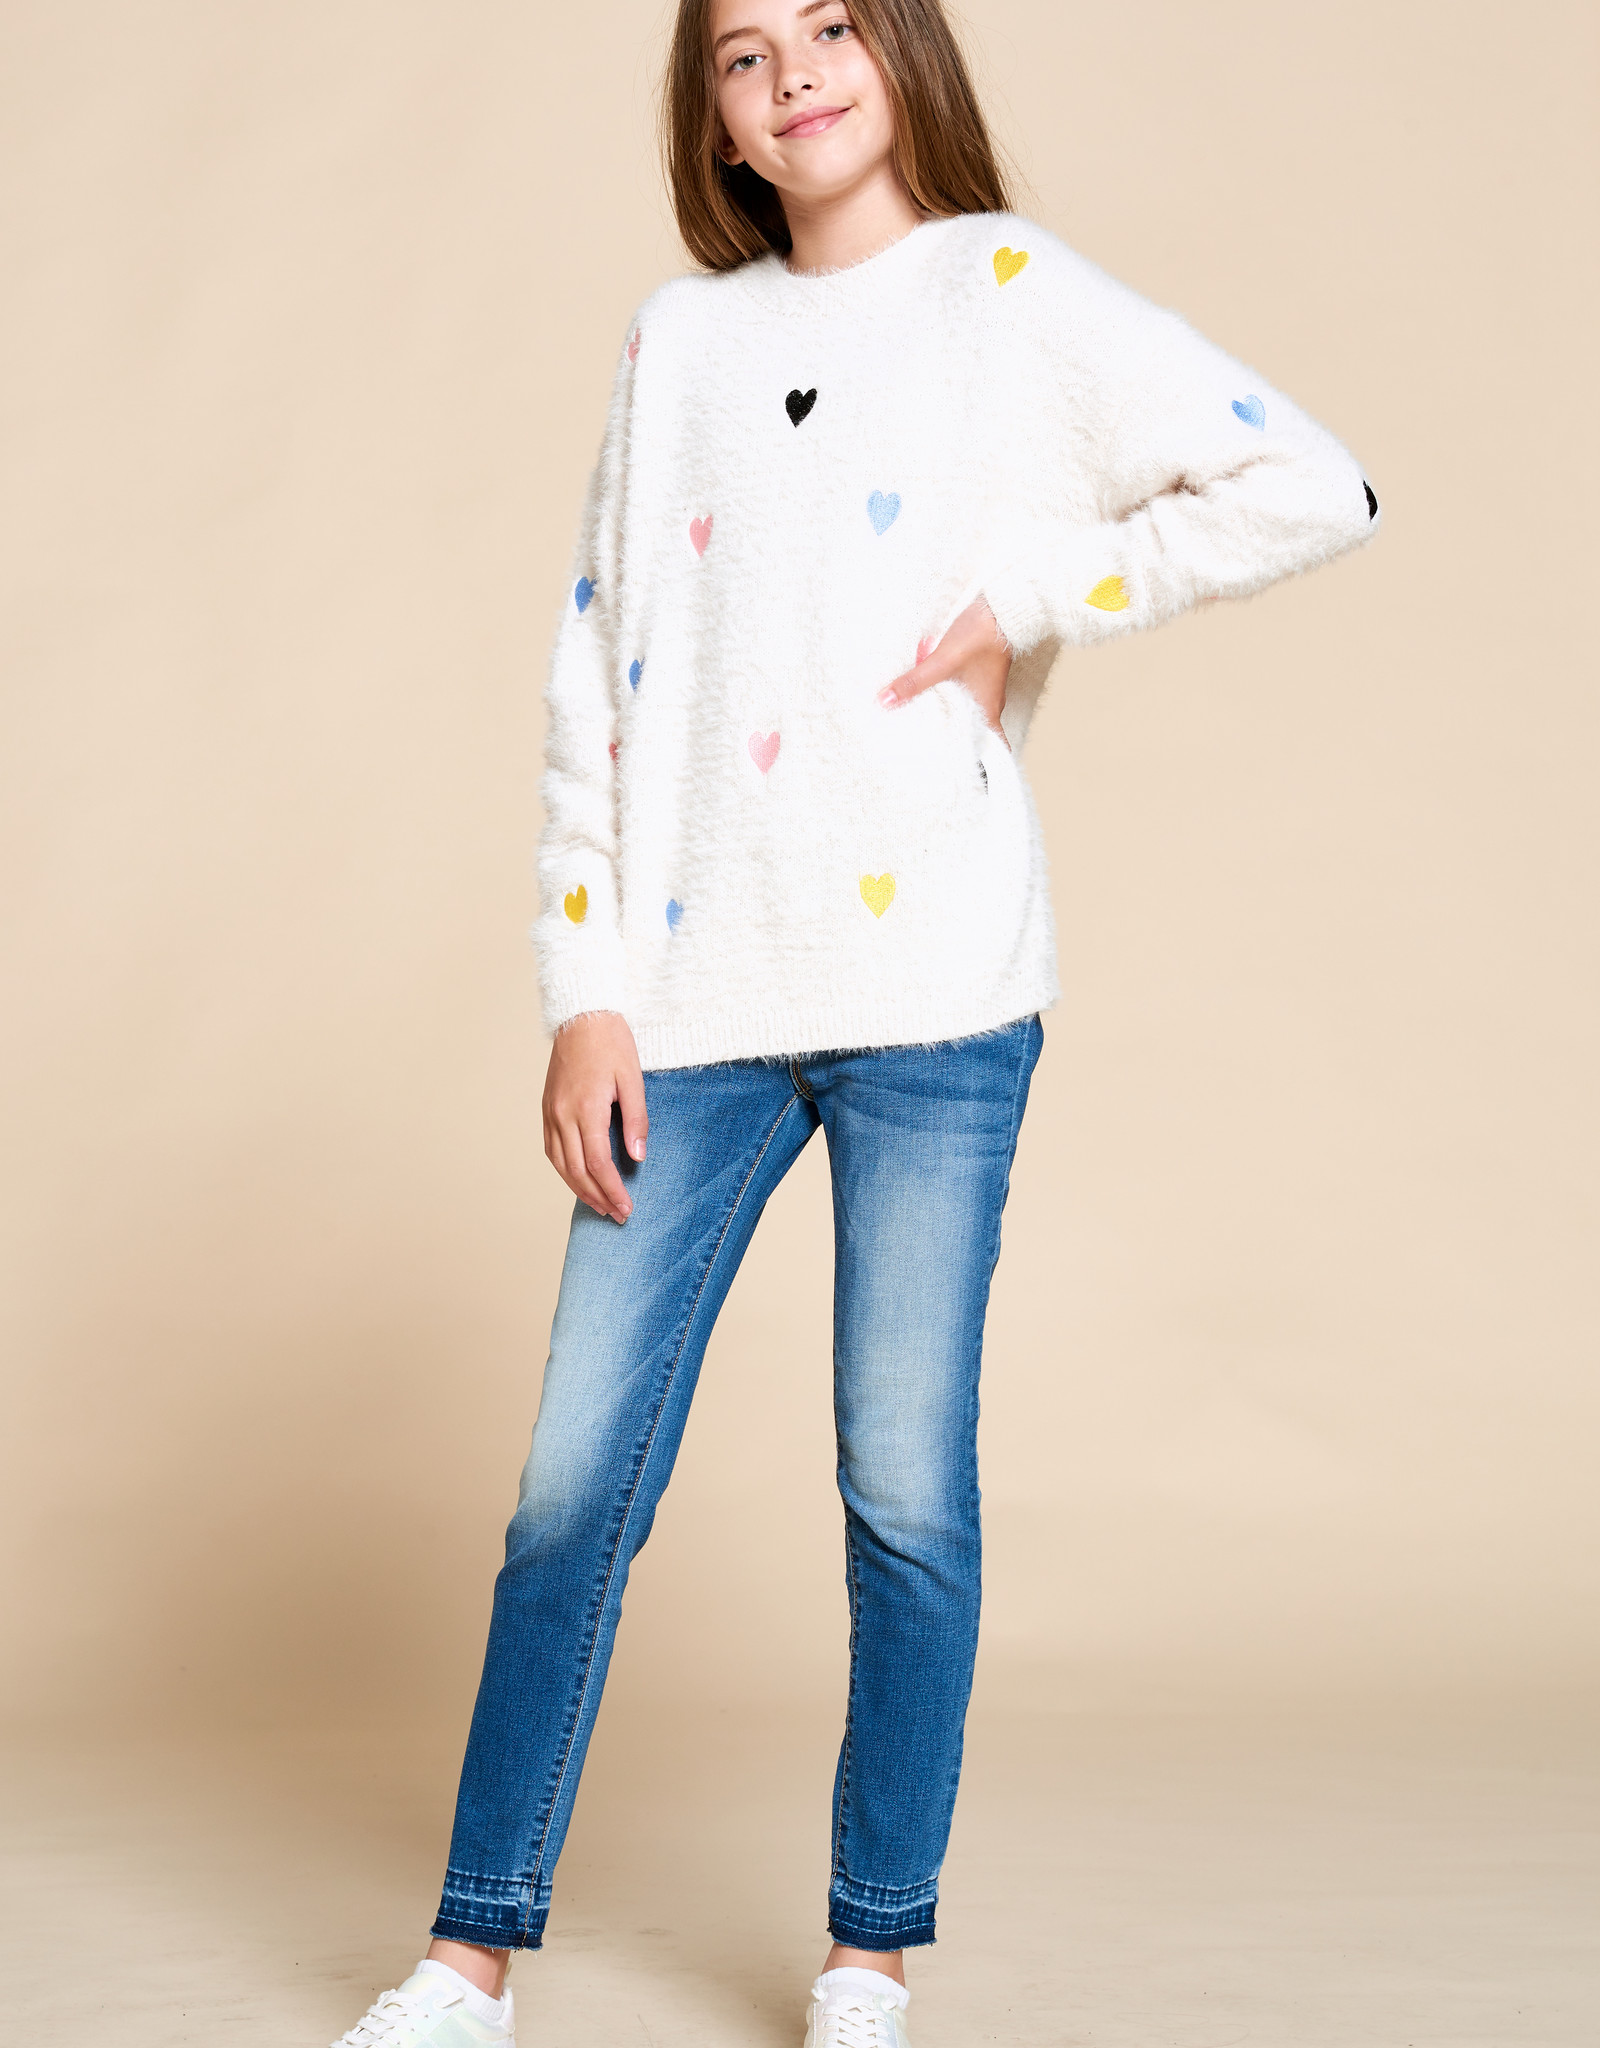 For All Seasons For All Seasons Fuzzy Heart Sweatshirt